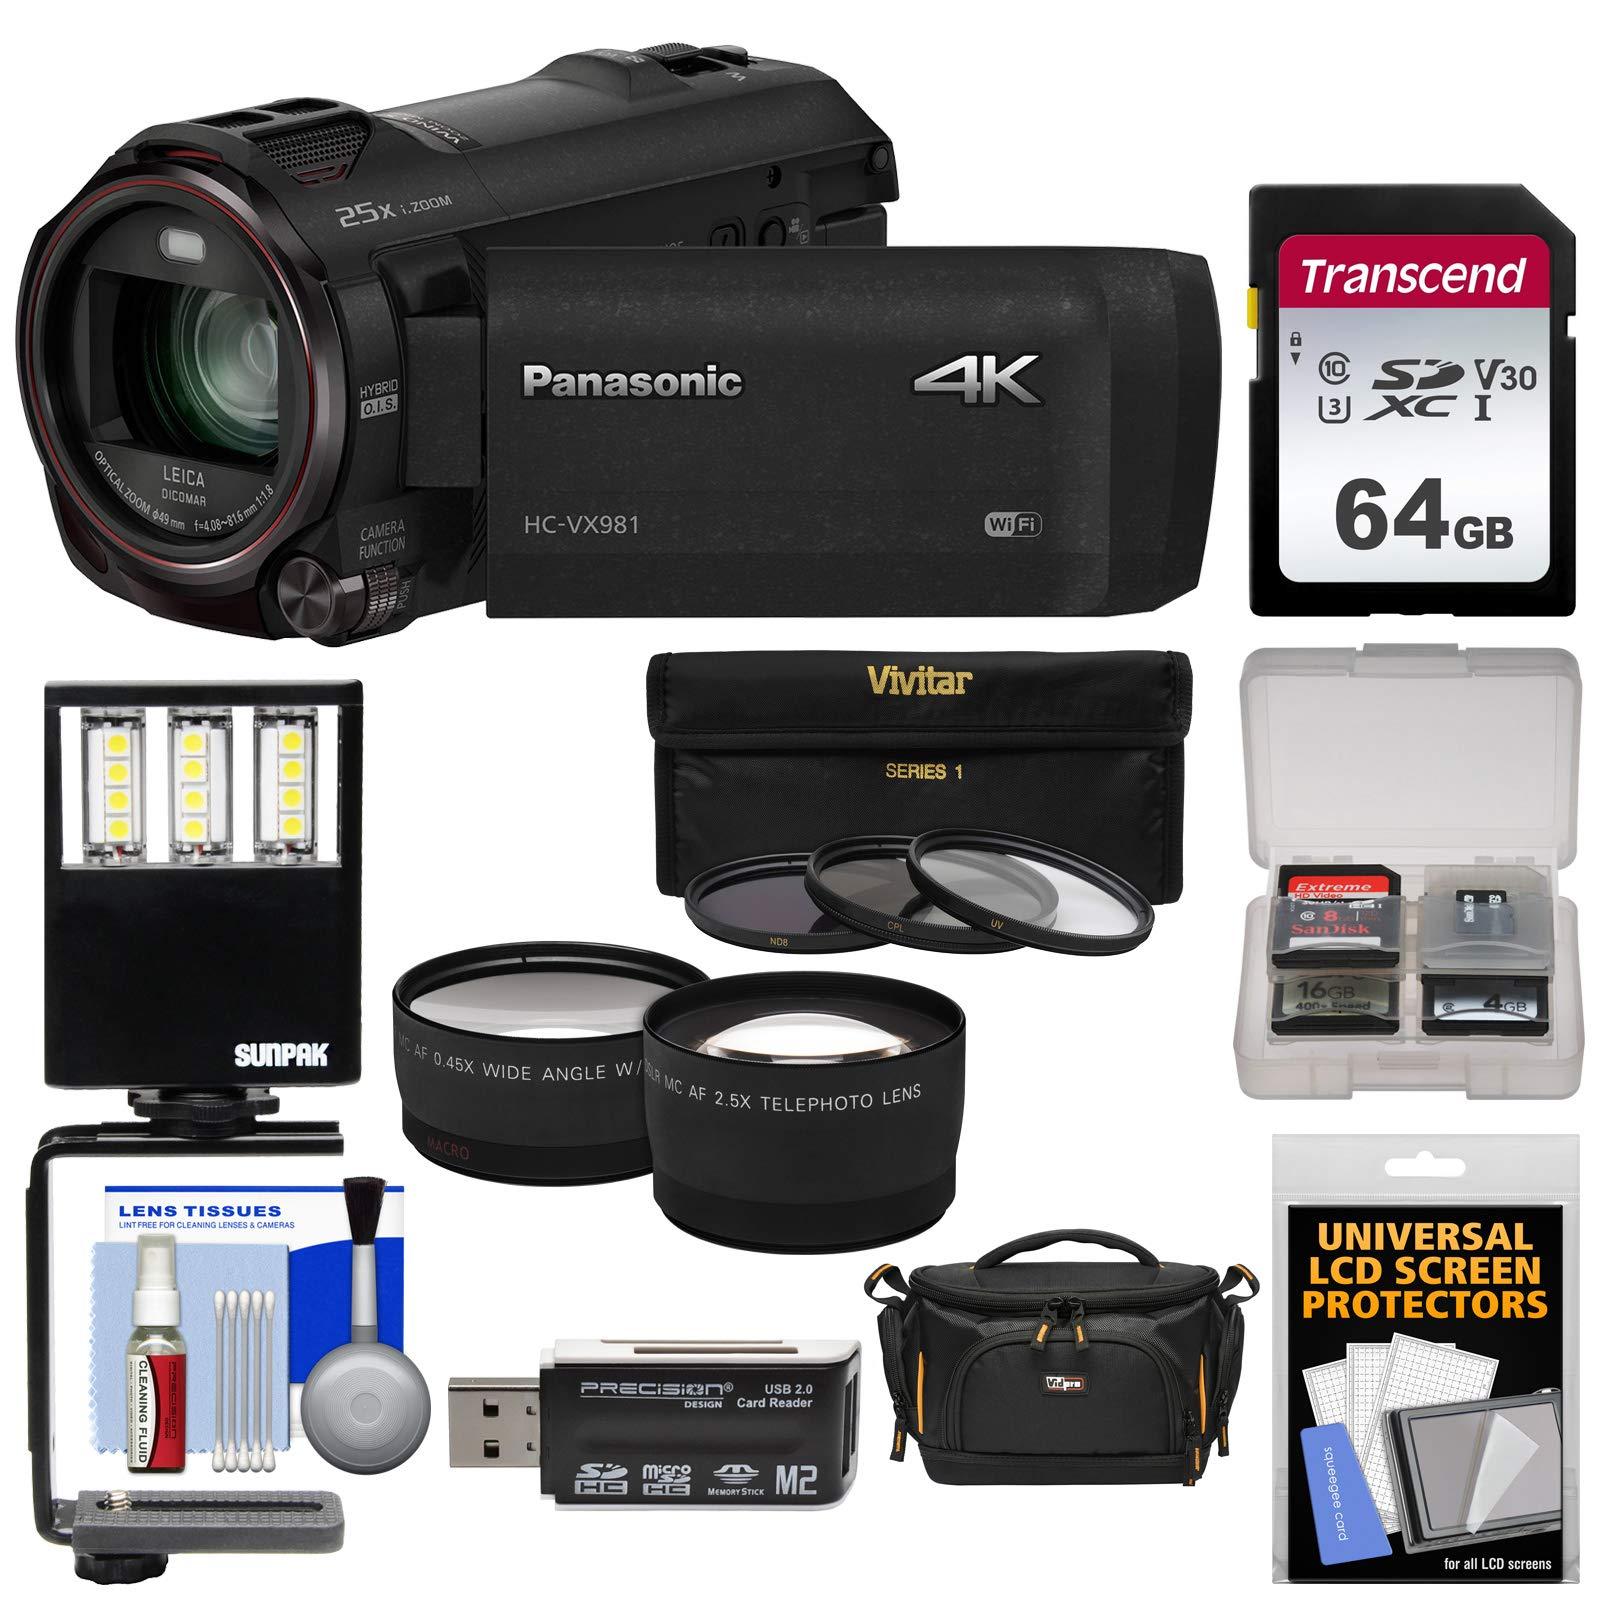 Panasonic HC-VX981 Wi-Fi 4K Ultra HD Video Camera Camcorder with 64GB Card + Case + LED Light + 3 Filters + Tele/Wide Lens Kit by Panasonic